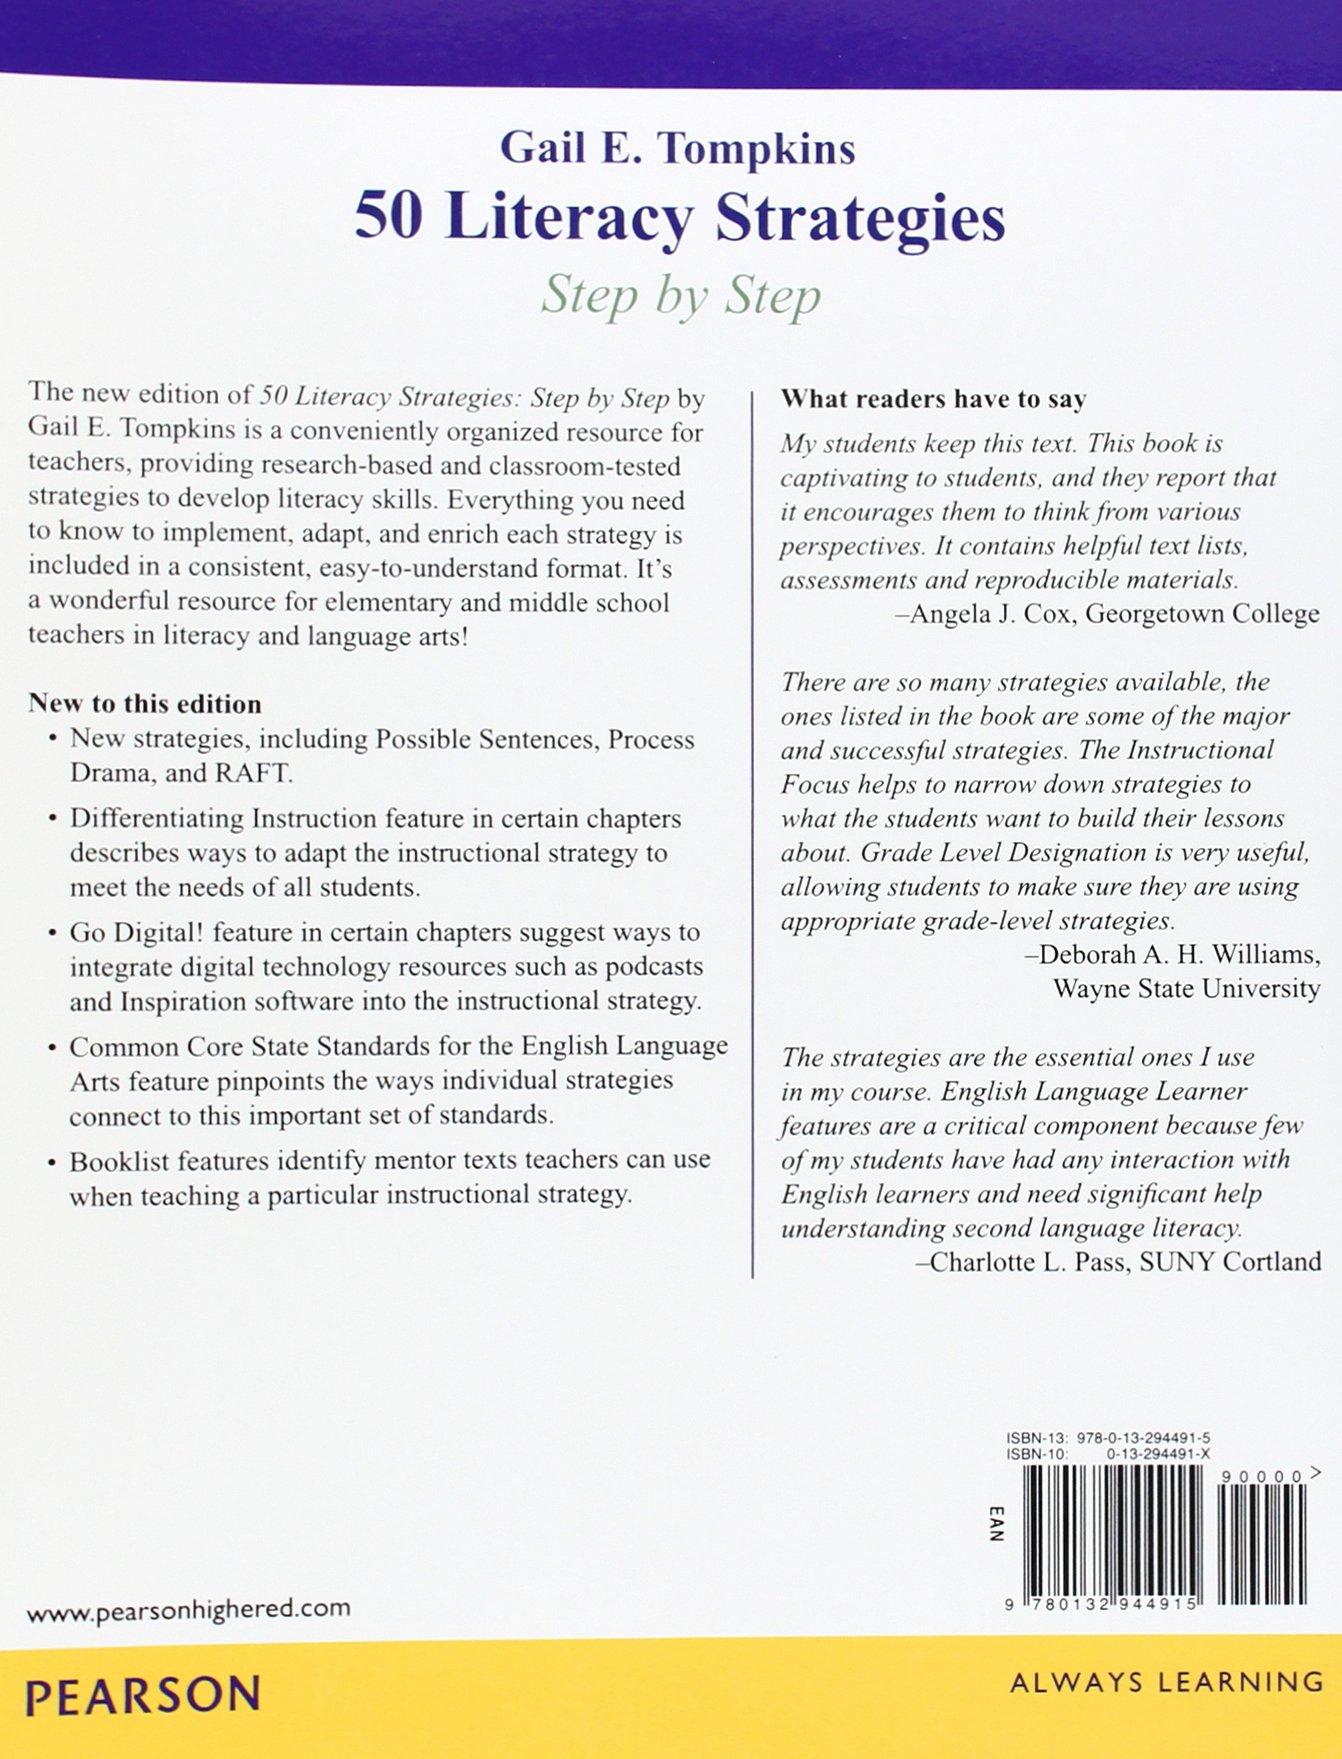 50 Literacy Strategies Step By Step Teaching Strategies Amazon